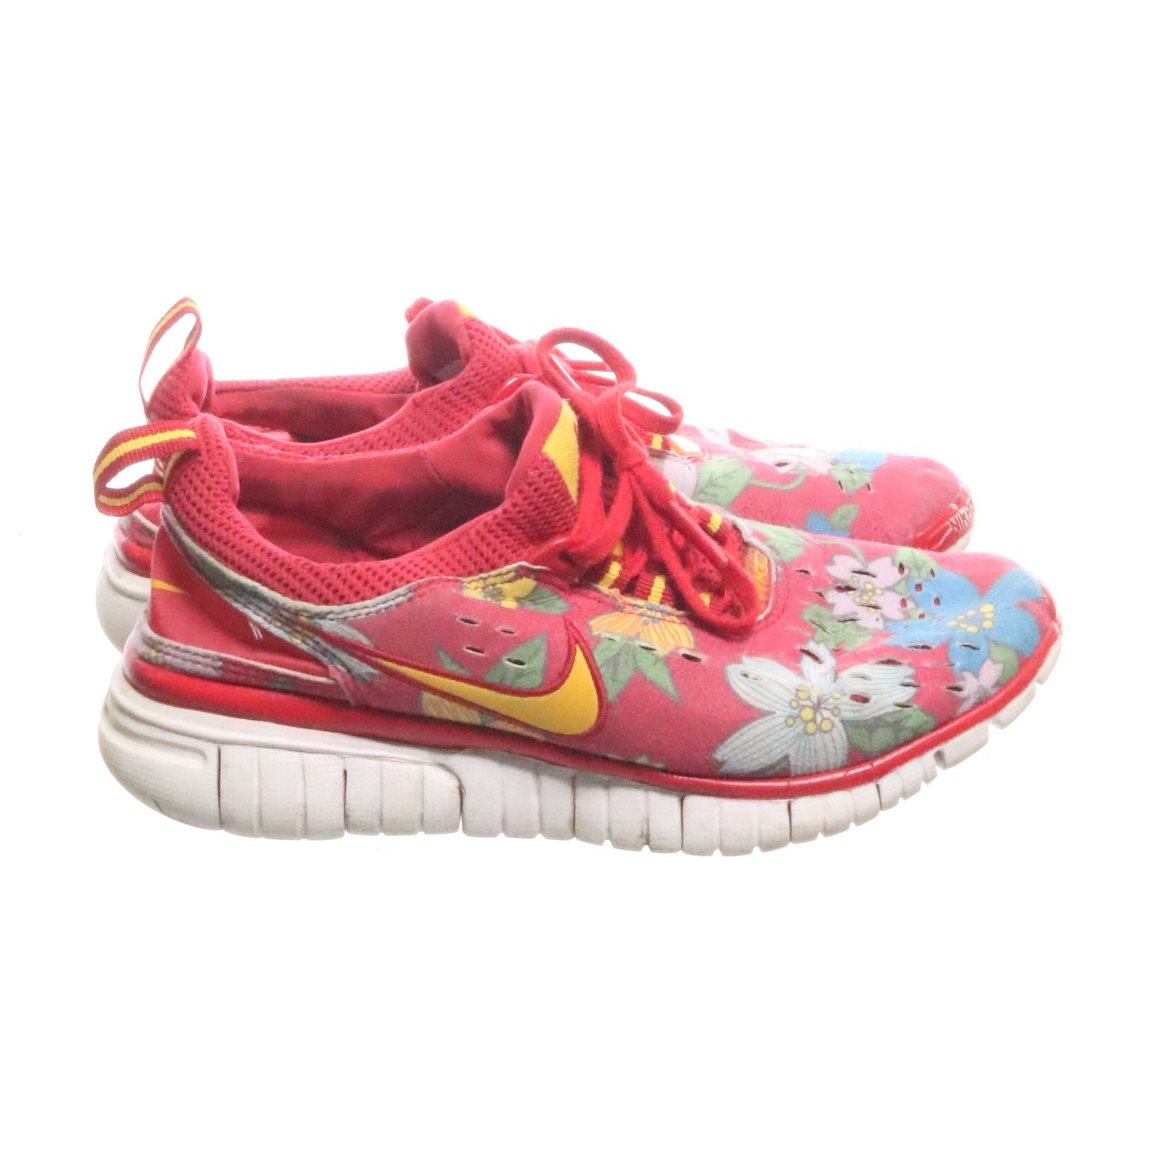 nike blommiga sneakers